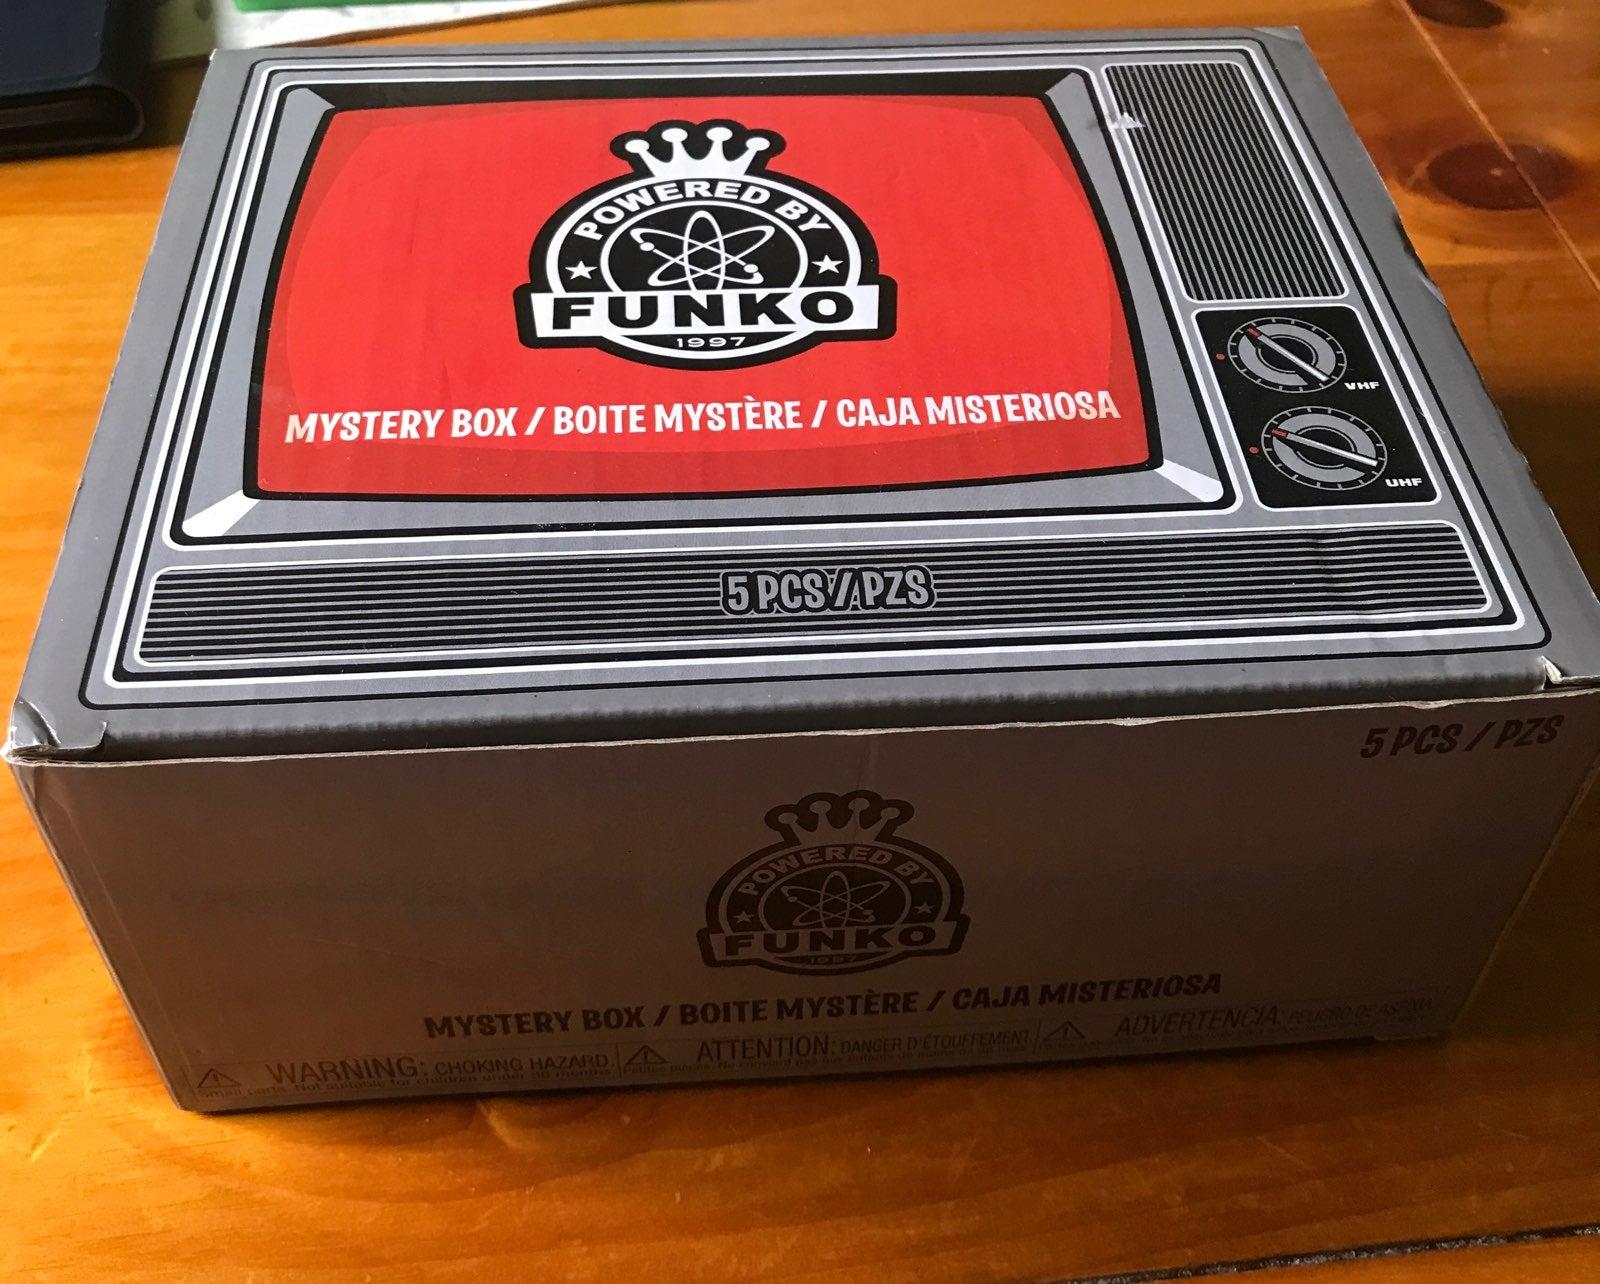 Funko Pop Mystery Box 5 Pcs